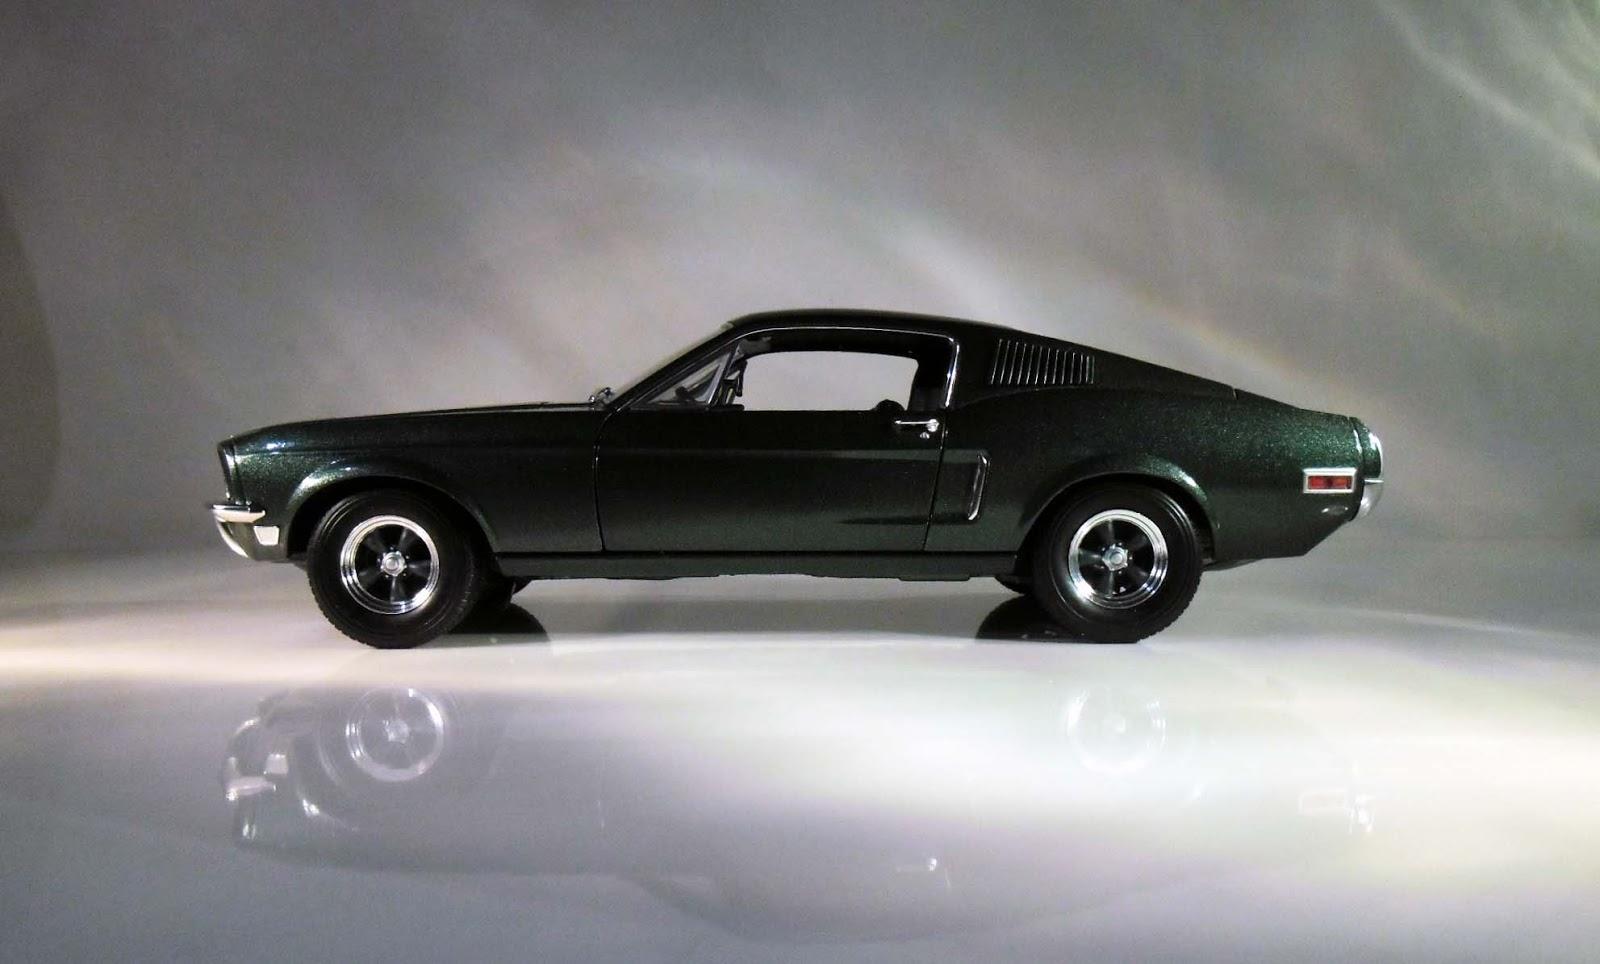 Ford Mustang GT 1968 verde sin restaurar Bullitt steve mcqueen coche modelo 1:18